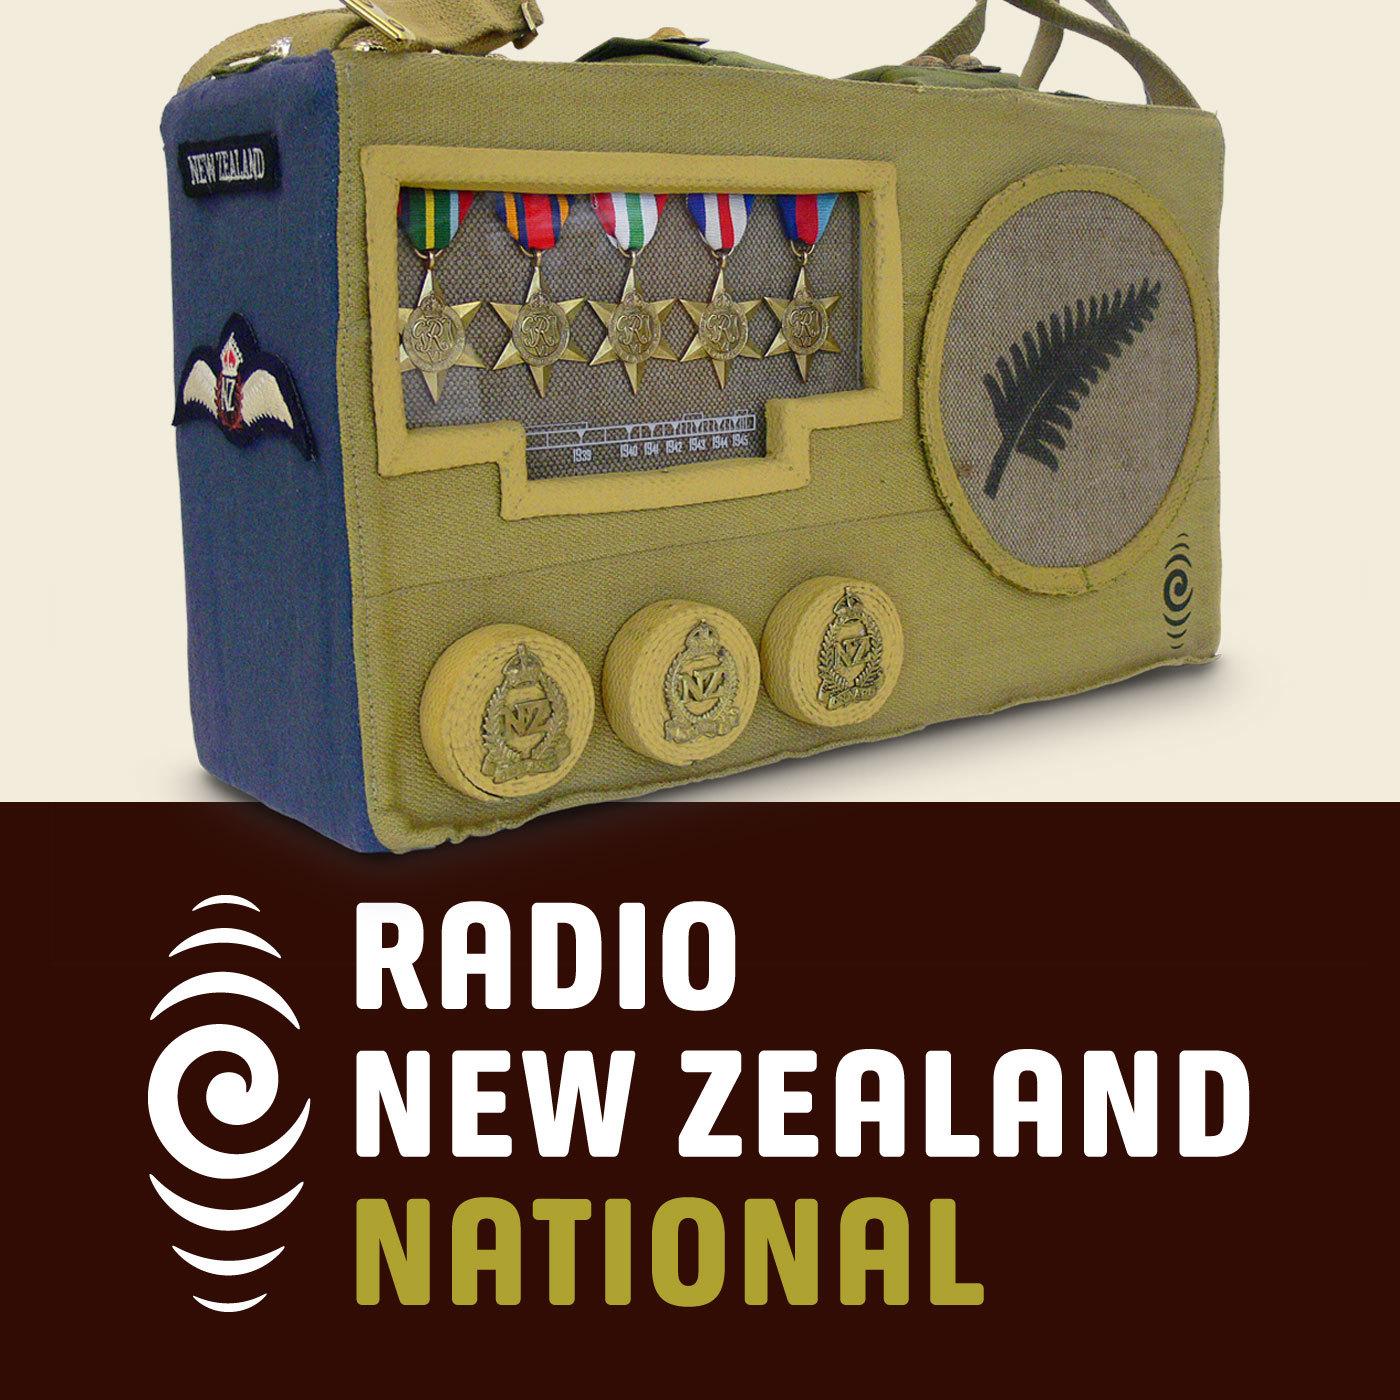 RNZ: Sounds Historical